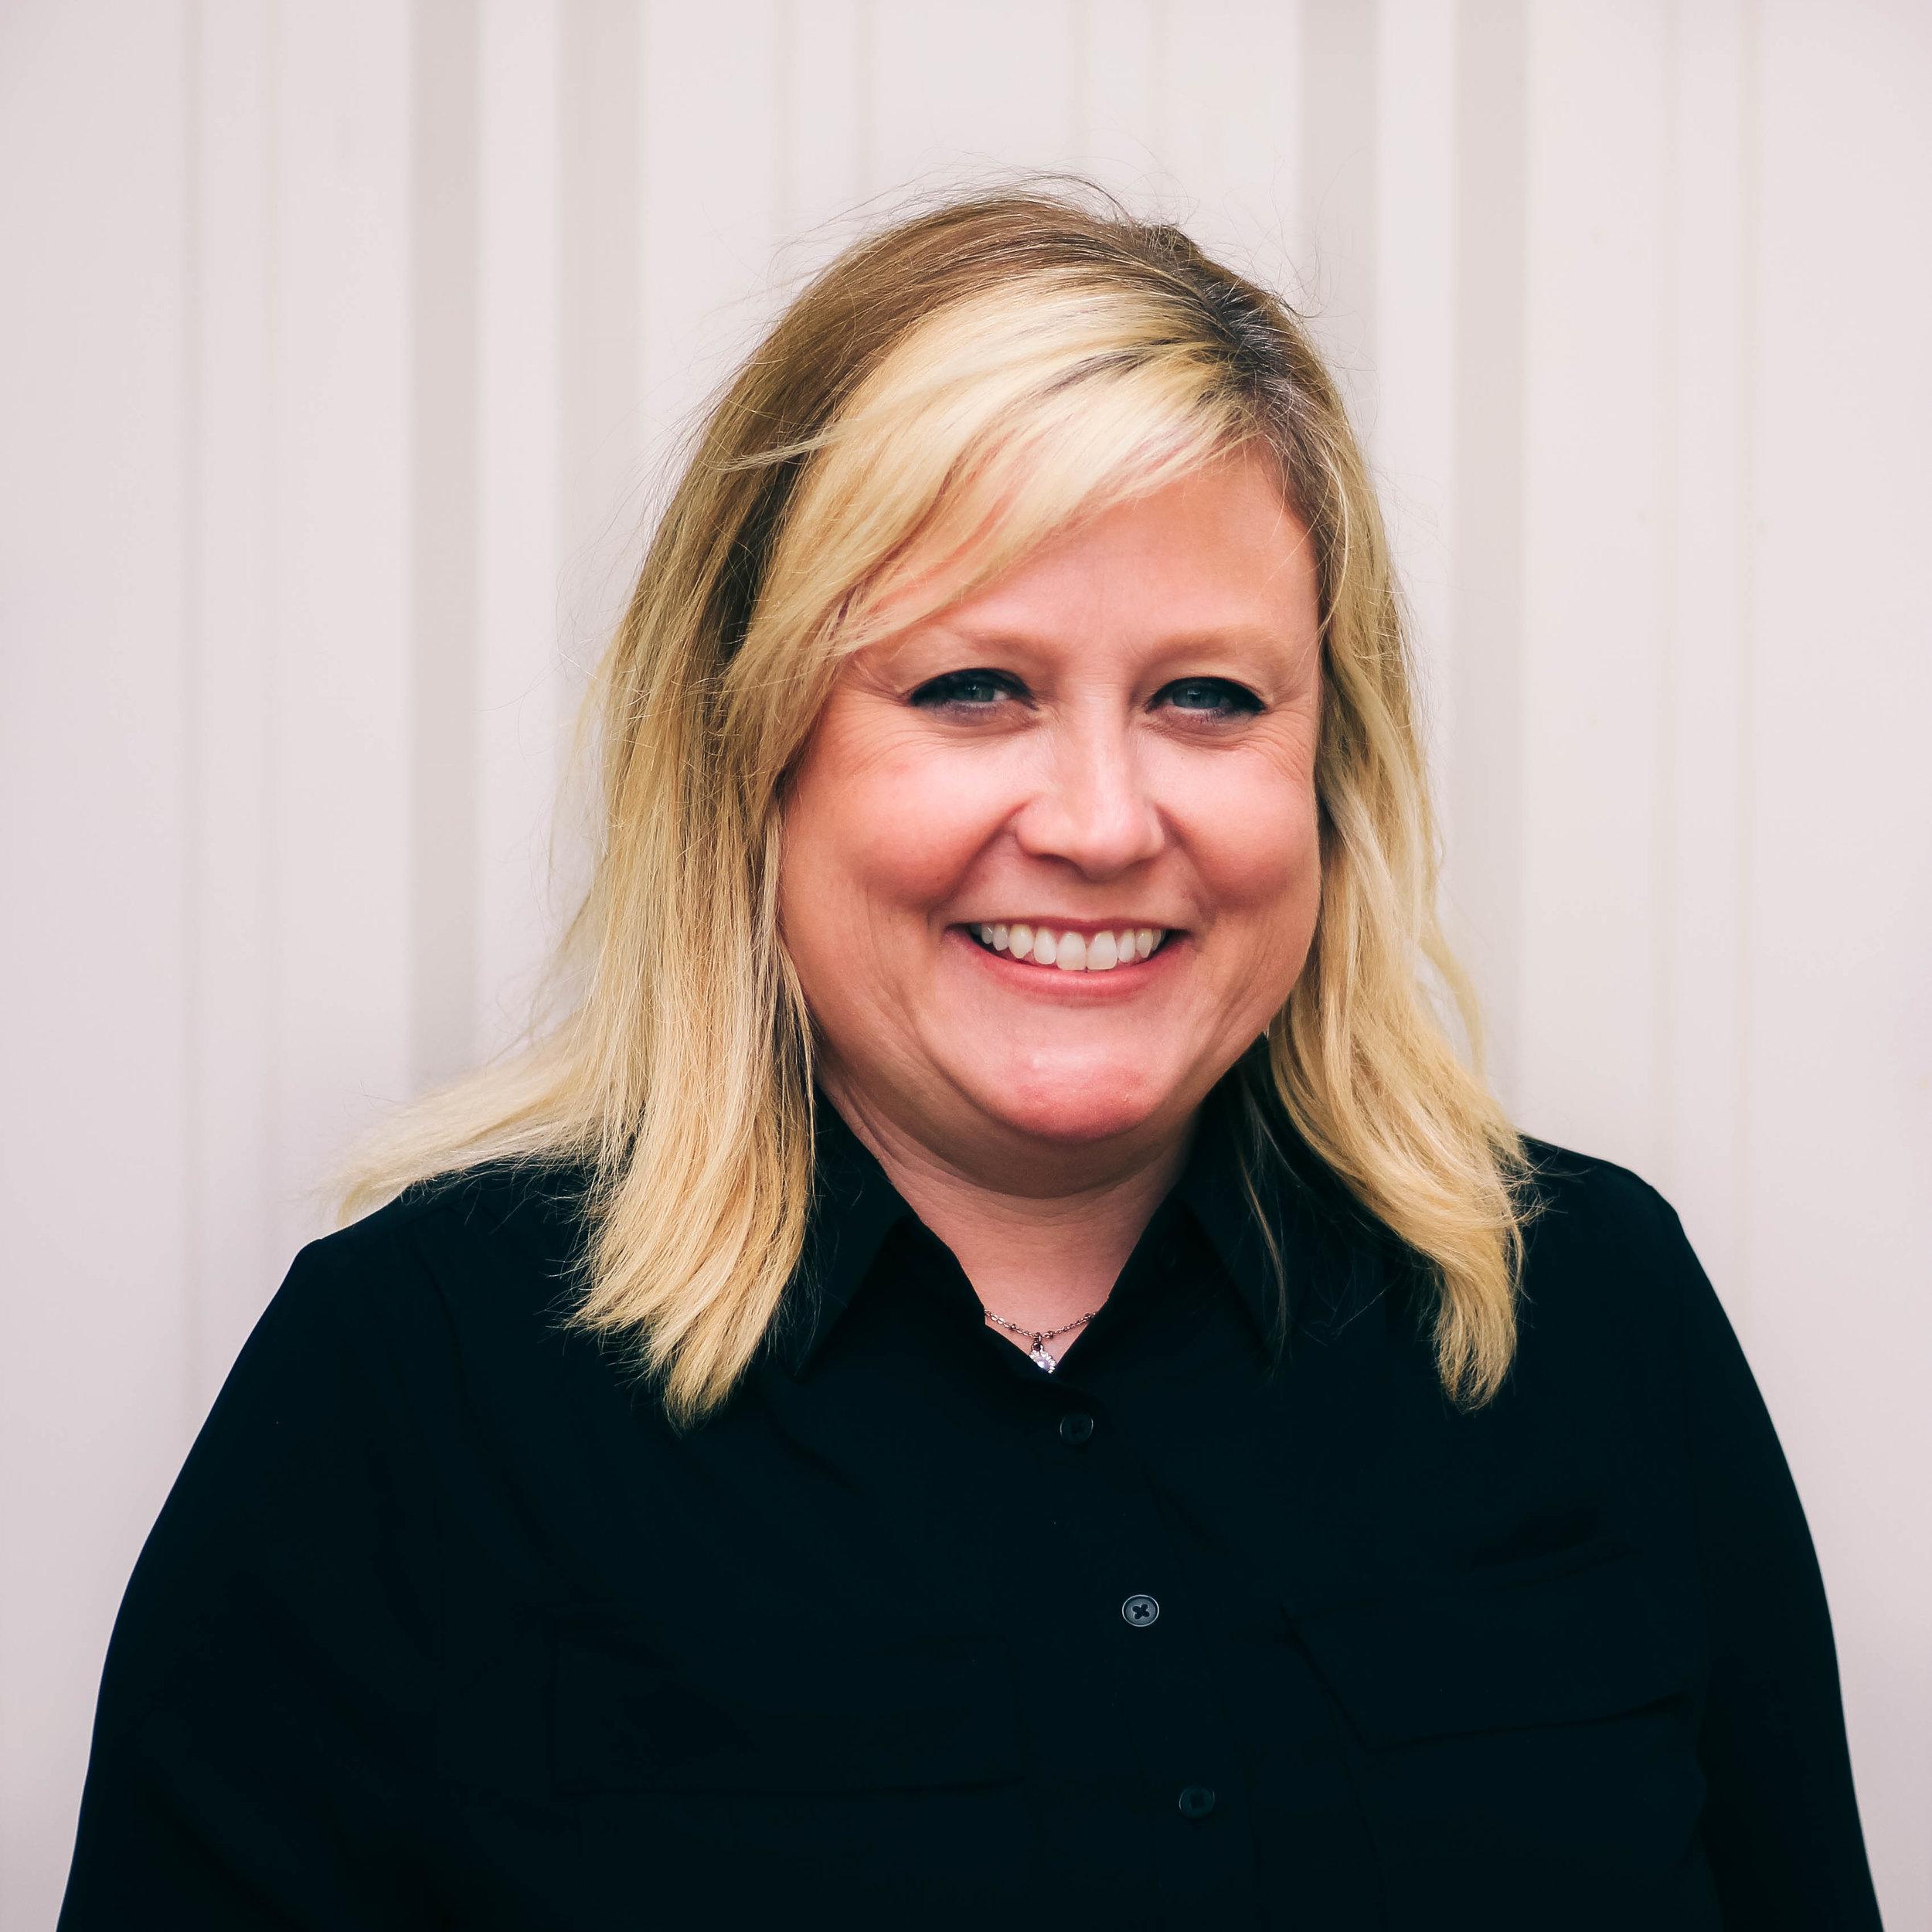 Stacey Spikereit   Family Pastor